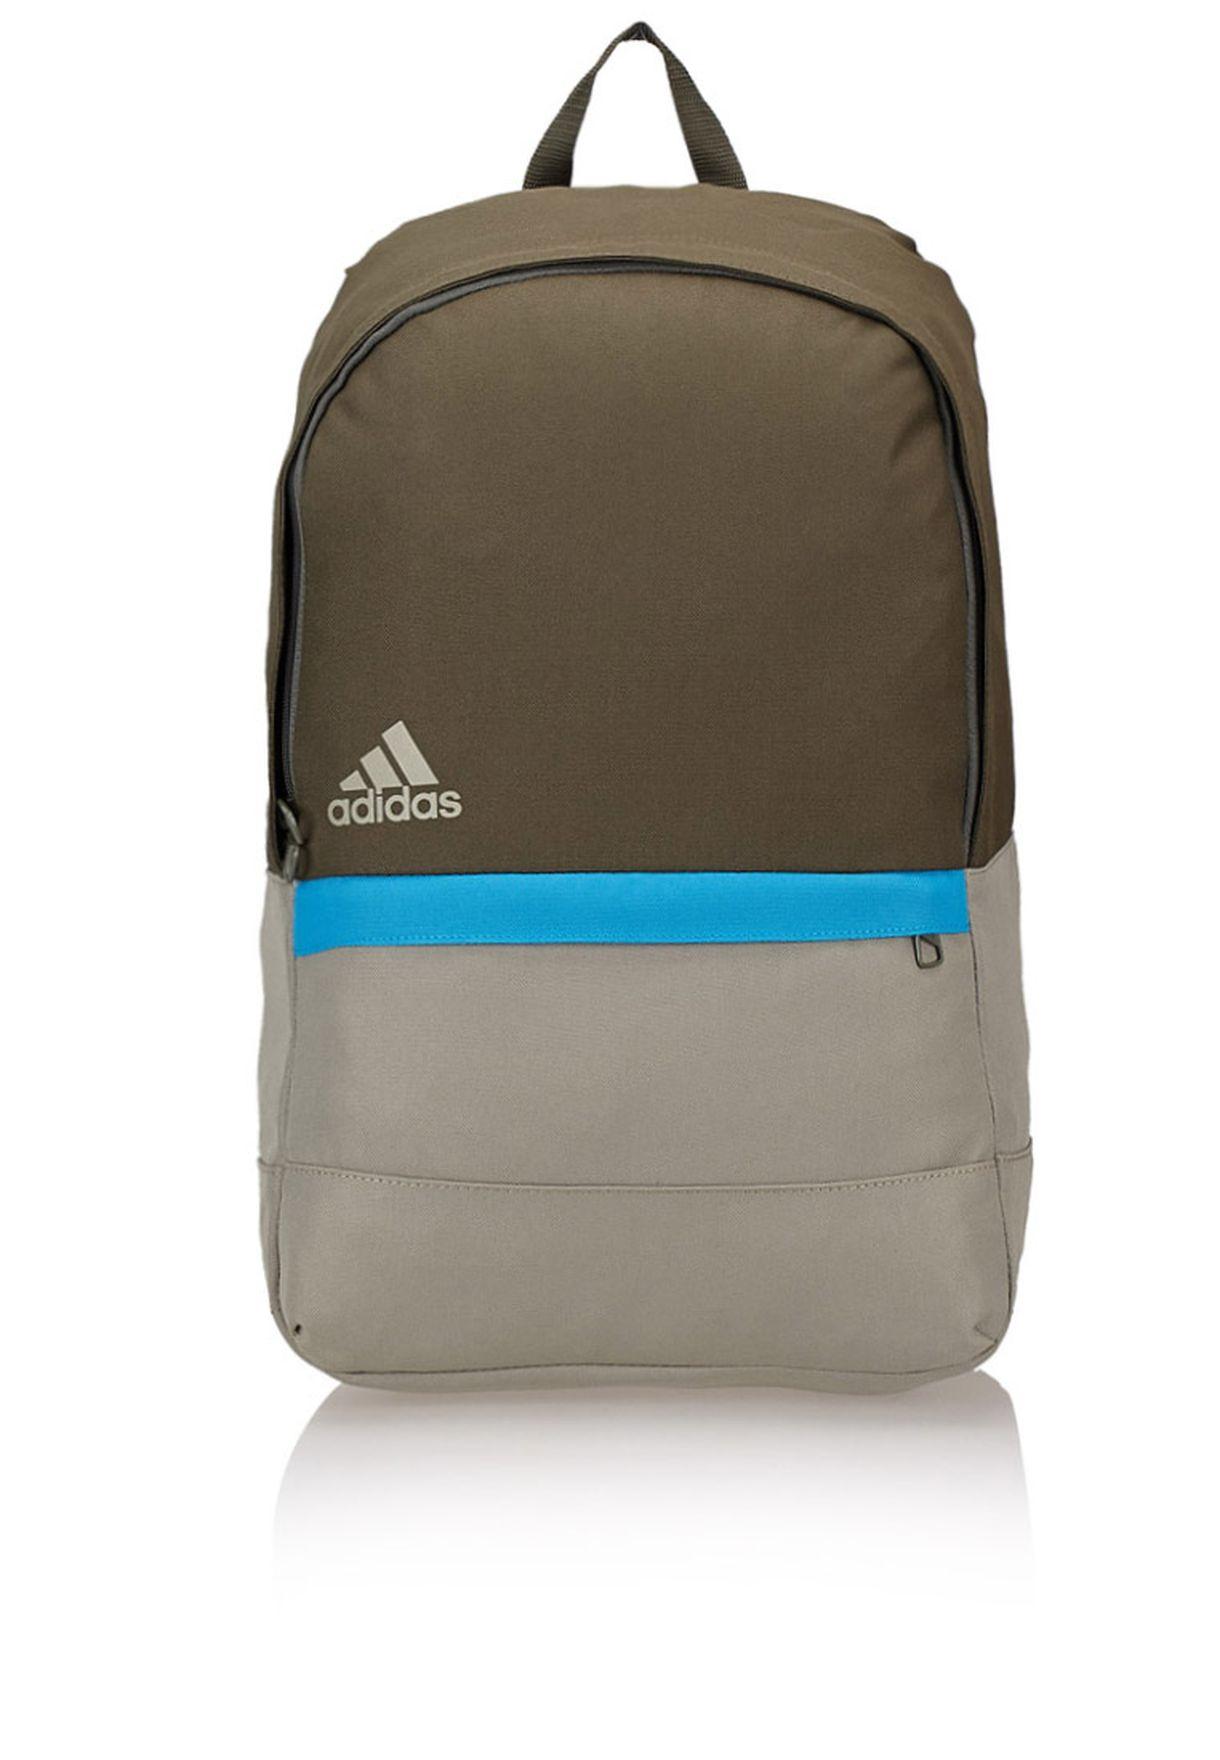 46a27d817089 Shop adidas beige Versatile Block Backpack M66755 for Men in Qatar -  AD476AC26RSJ